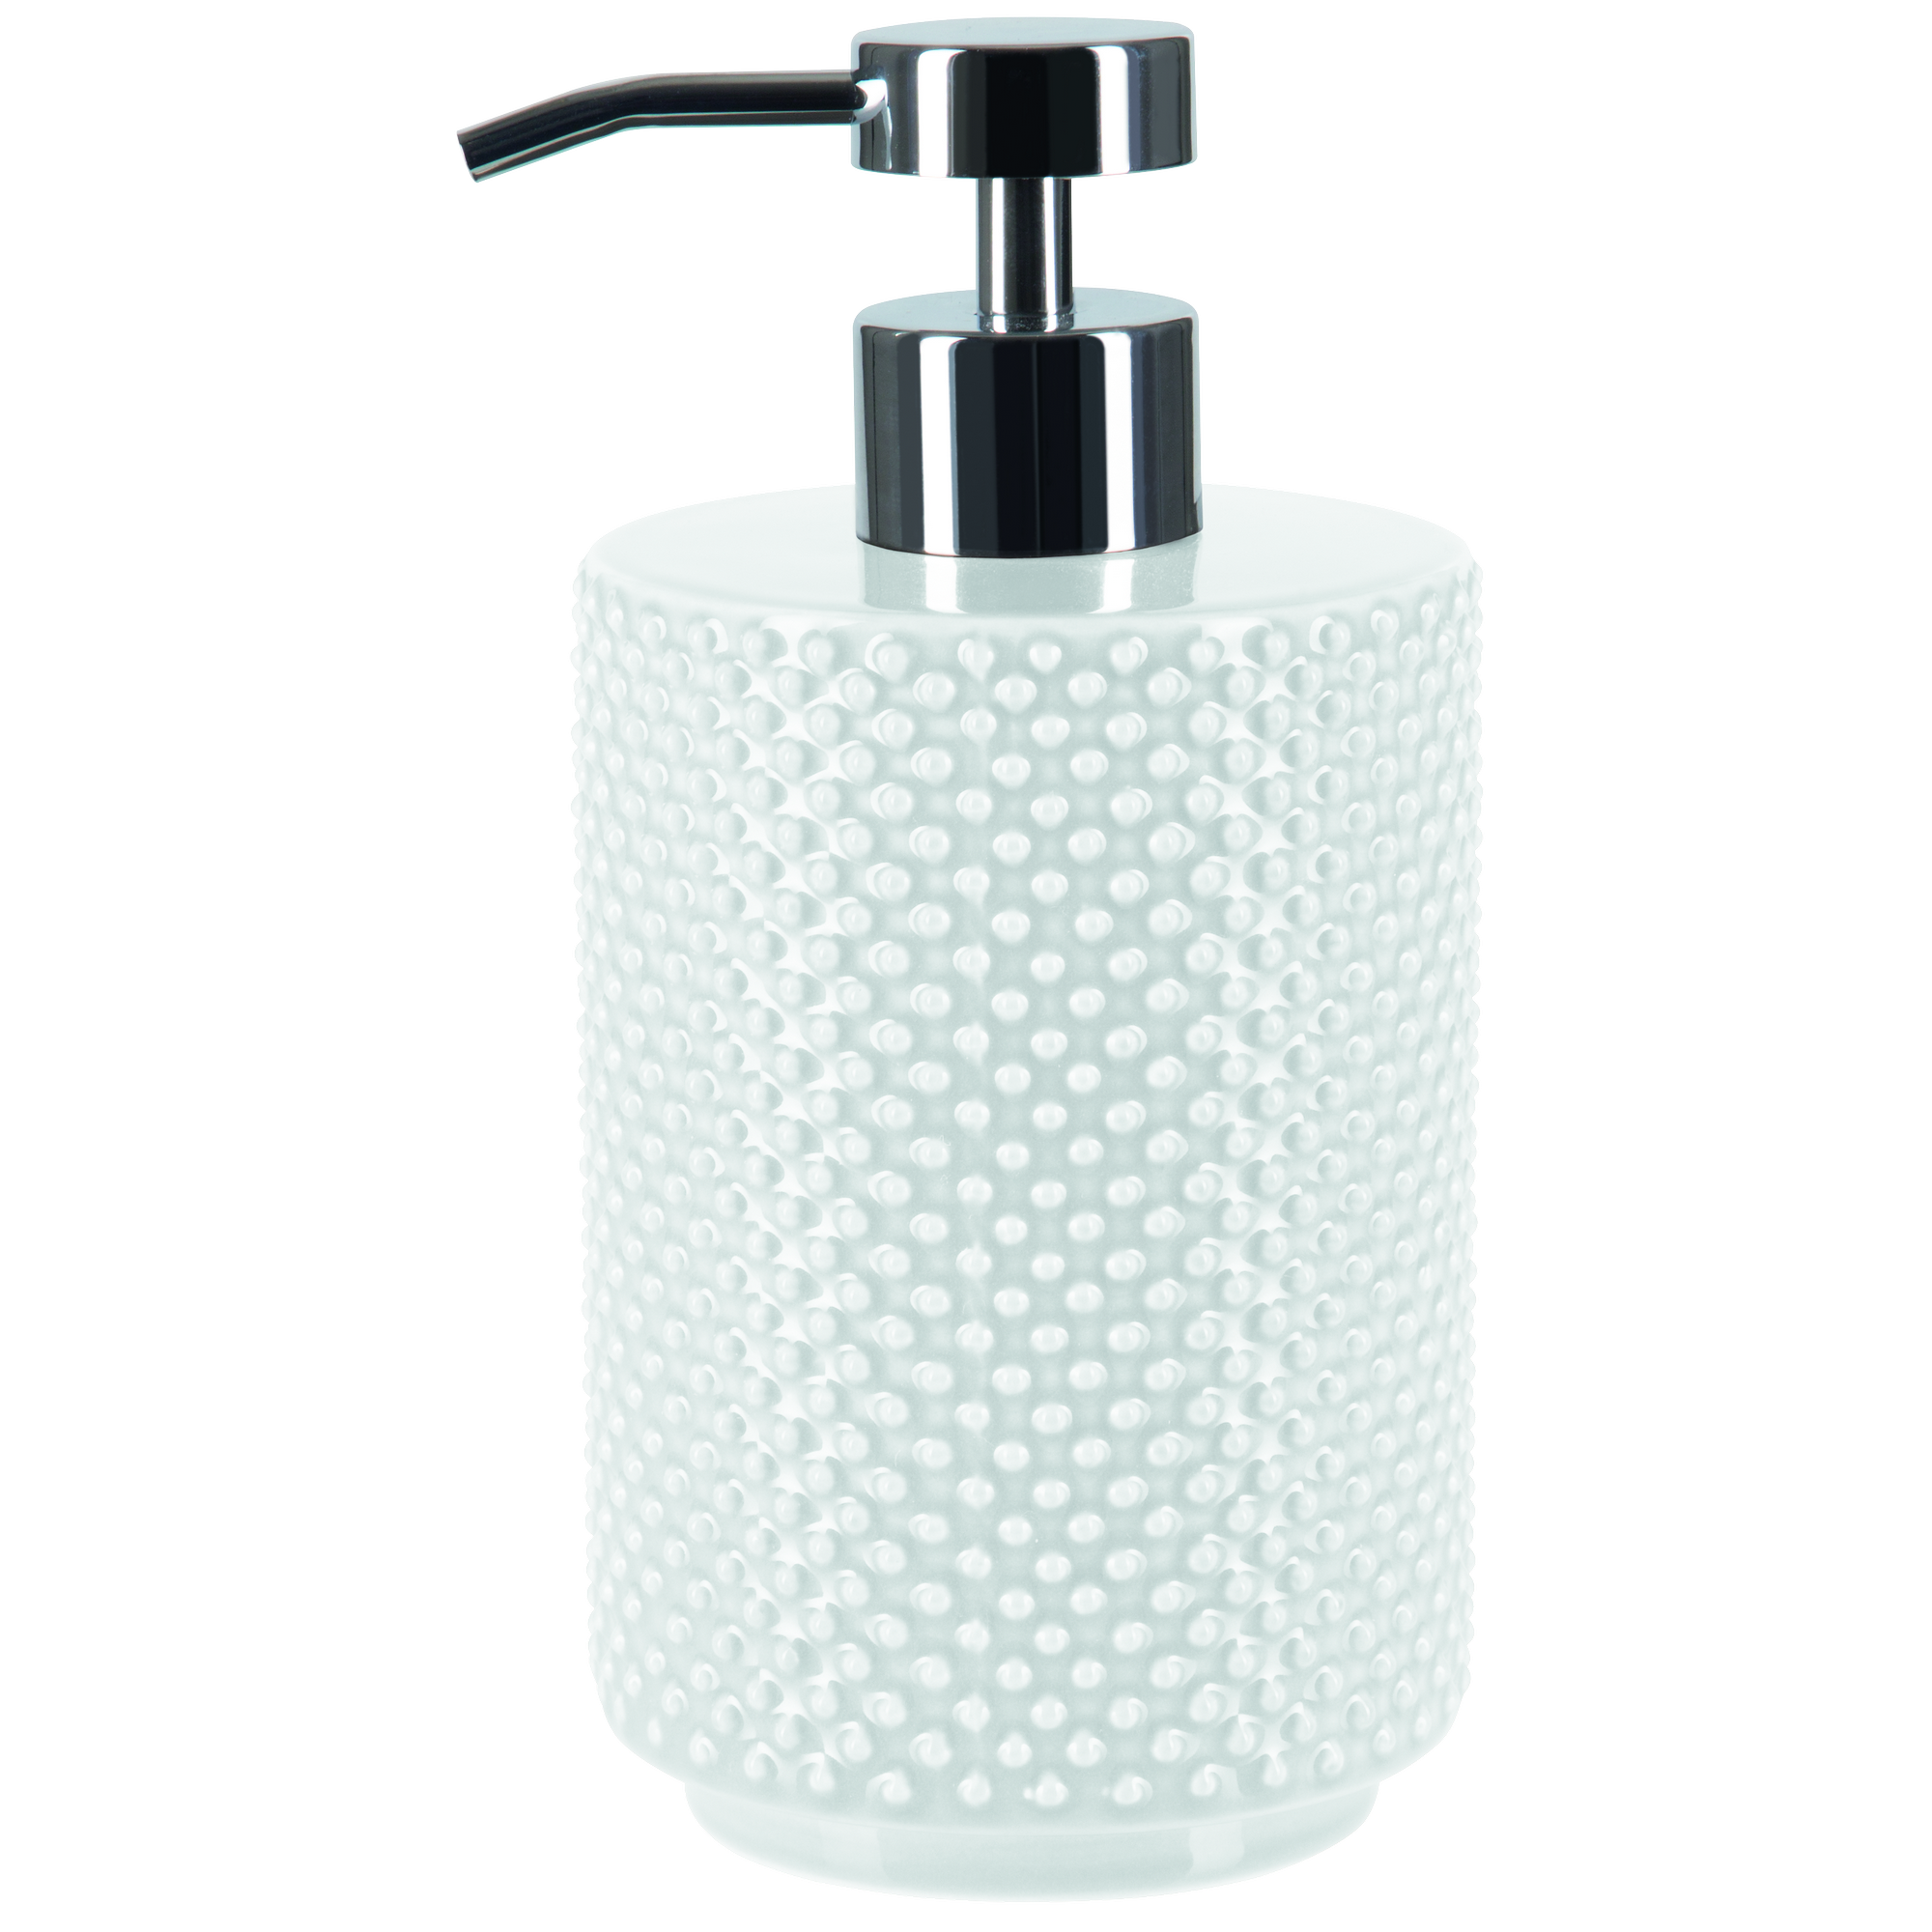 3-FACH SEIFENSPENDER BAD SOAP SHAMPOO DISPENSER WANDMONTAGE SPENDER DHL